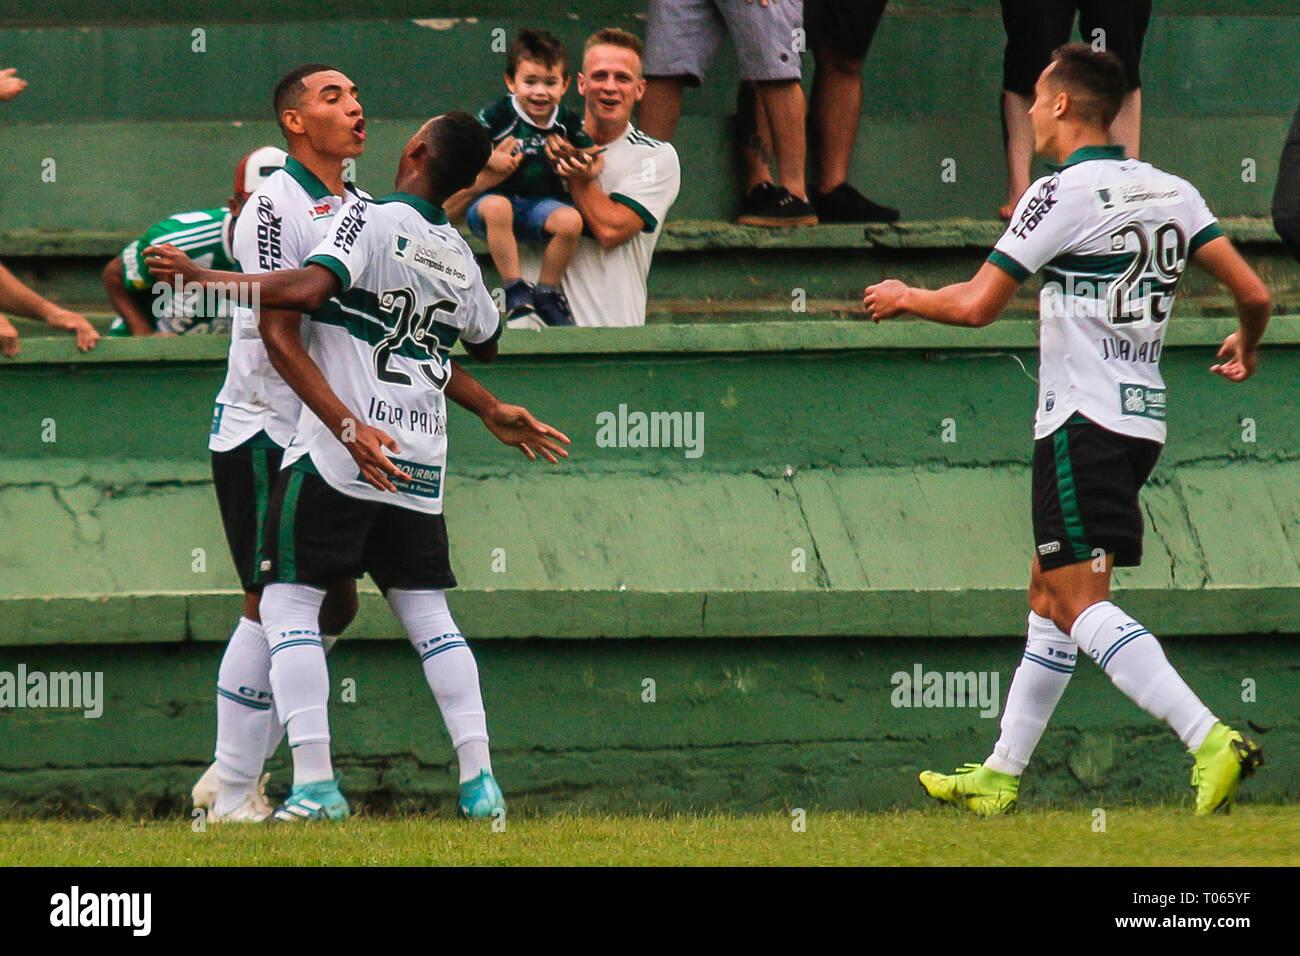 PR - Curitiba - 03/17/2019 - Paranaense 2019, Coritiba x Cascavel FC - Igor  Jesus Coritiba player celebrates